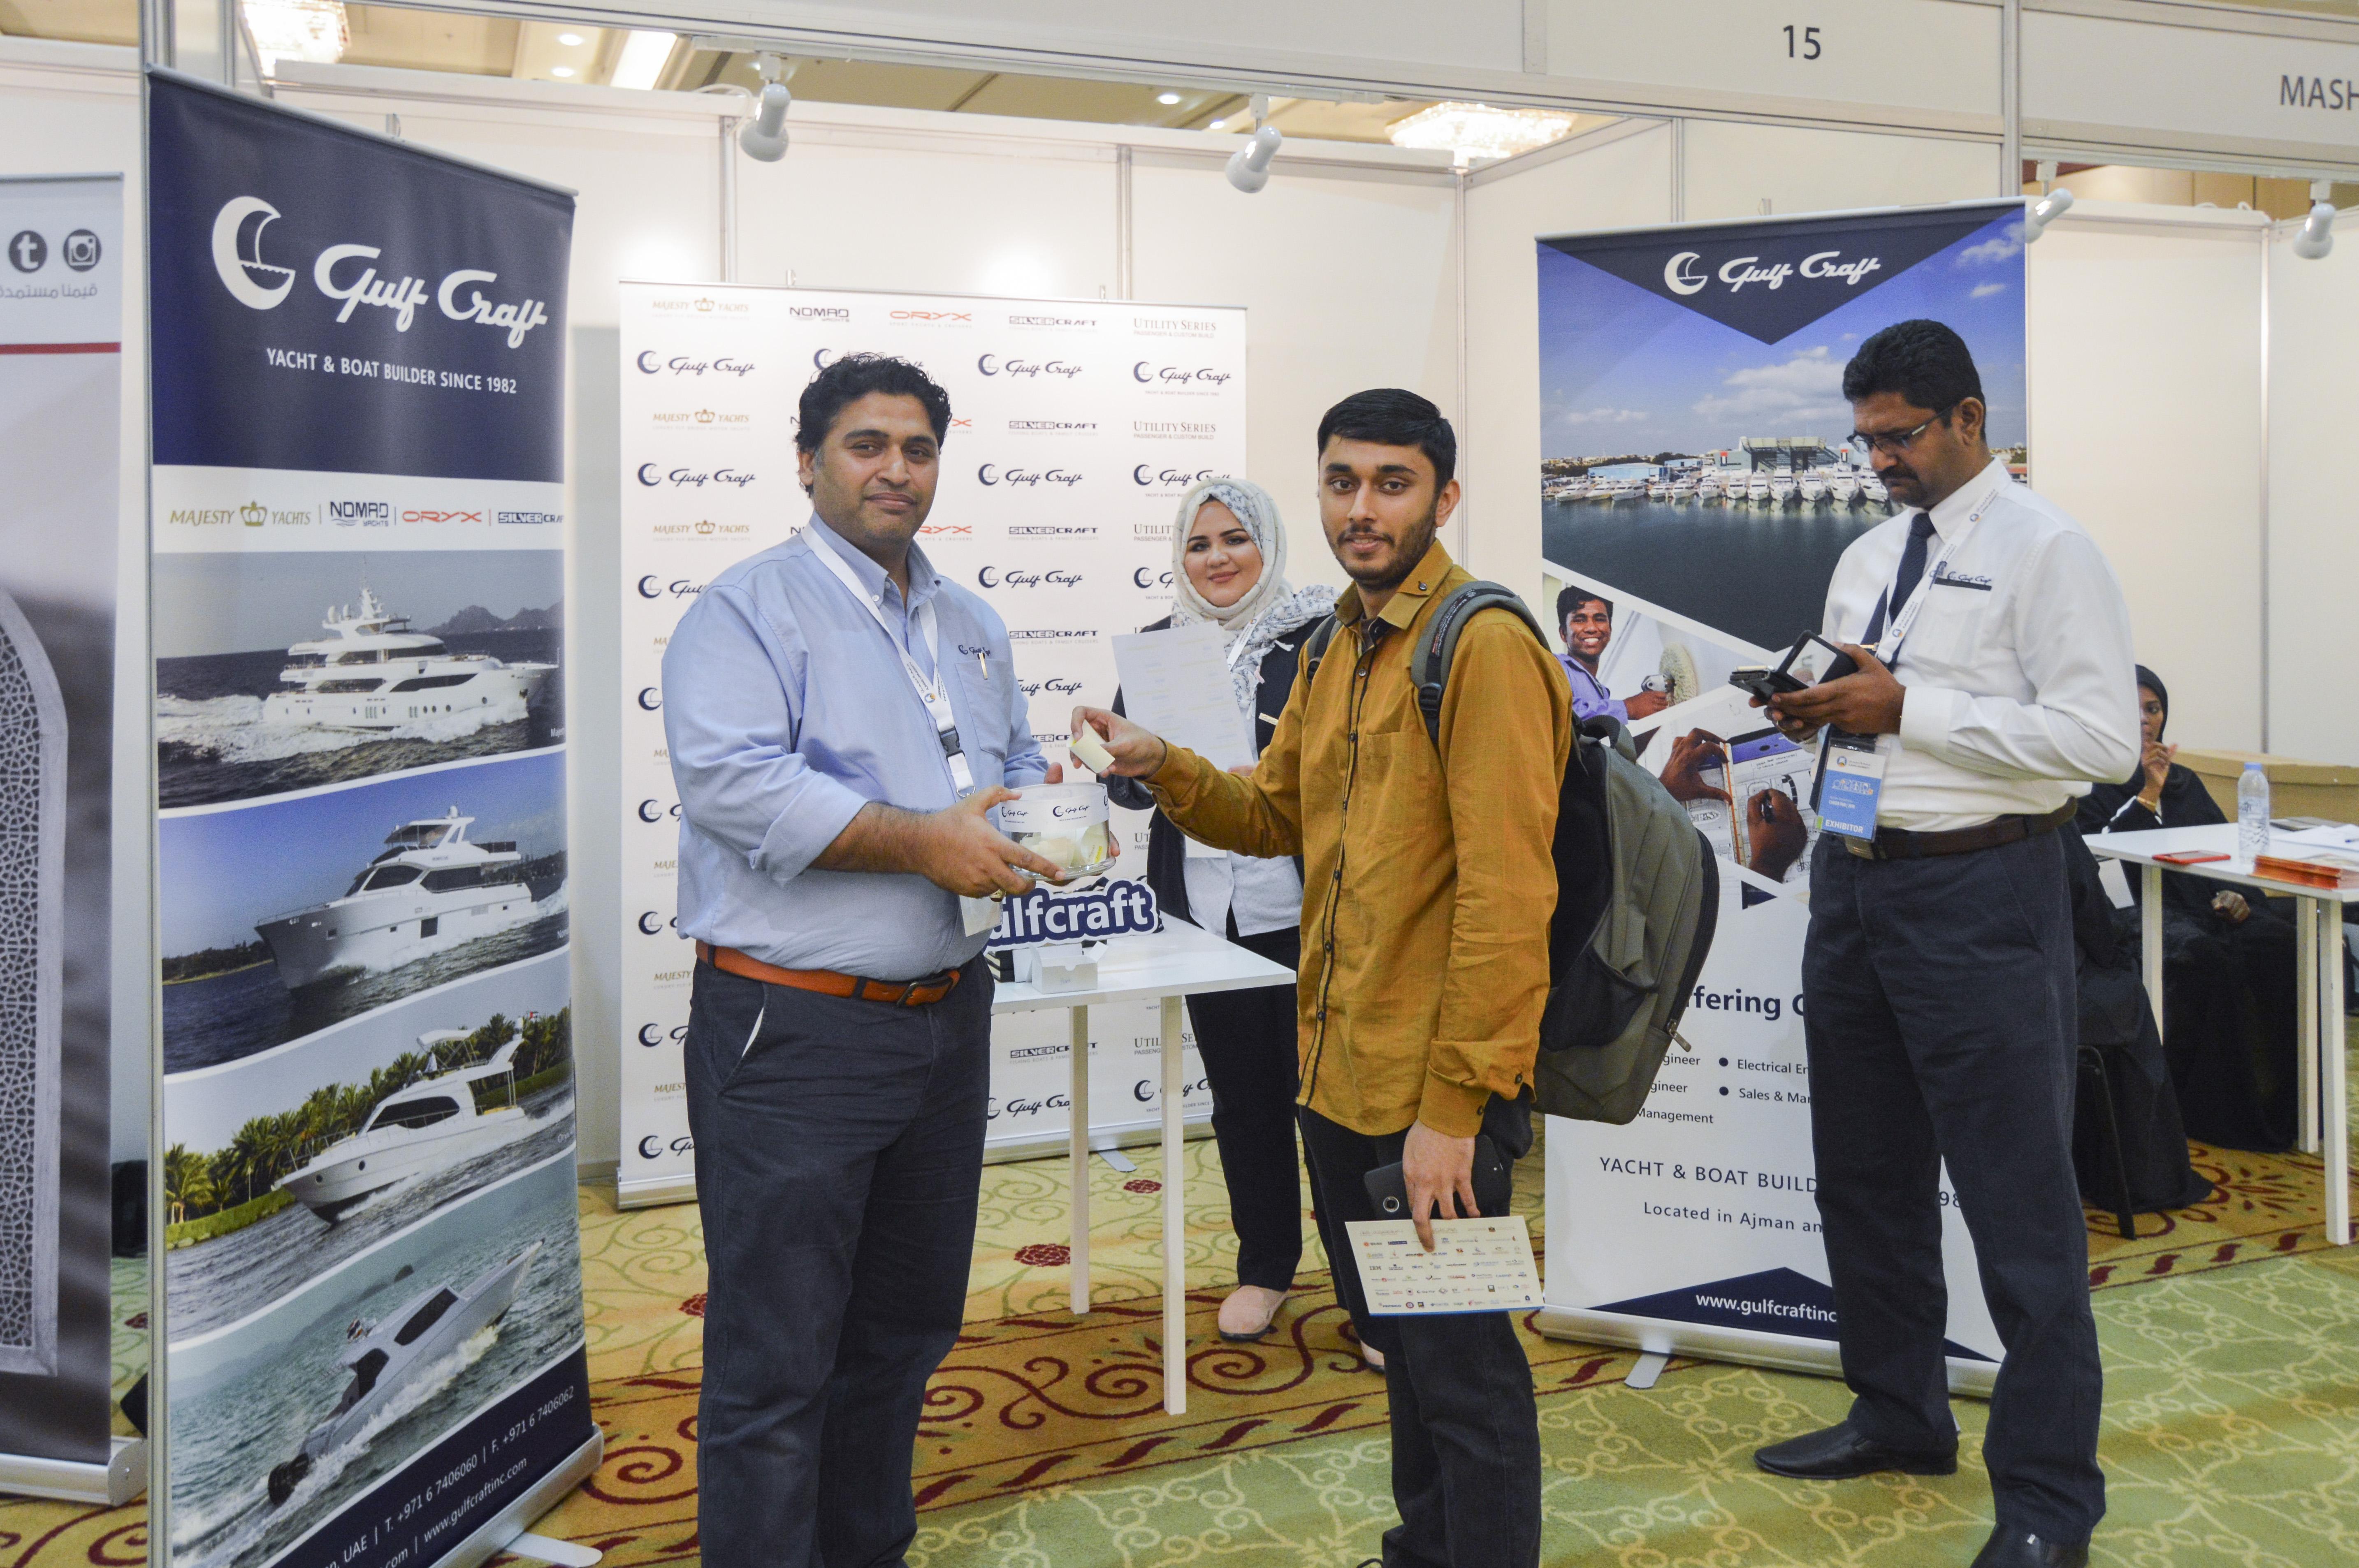 Gulf Craft at Ajman University Job Fair 2018 (10).jpg